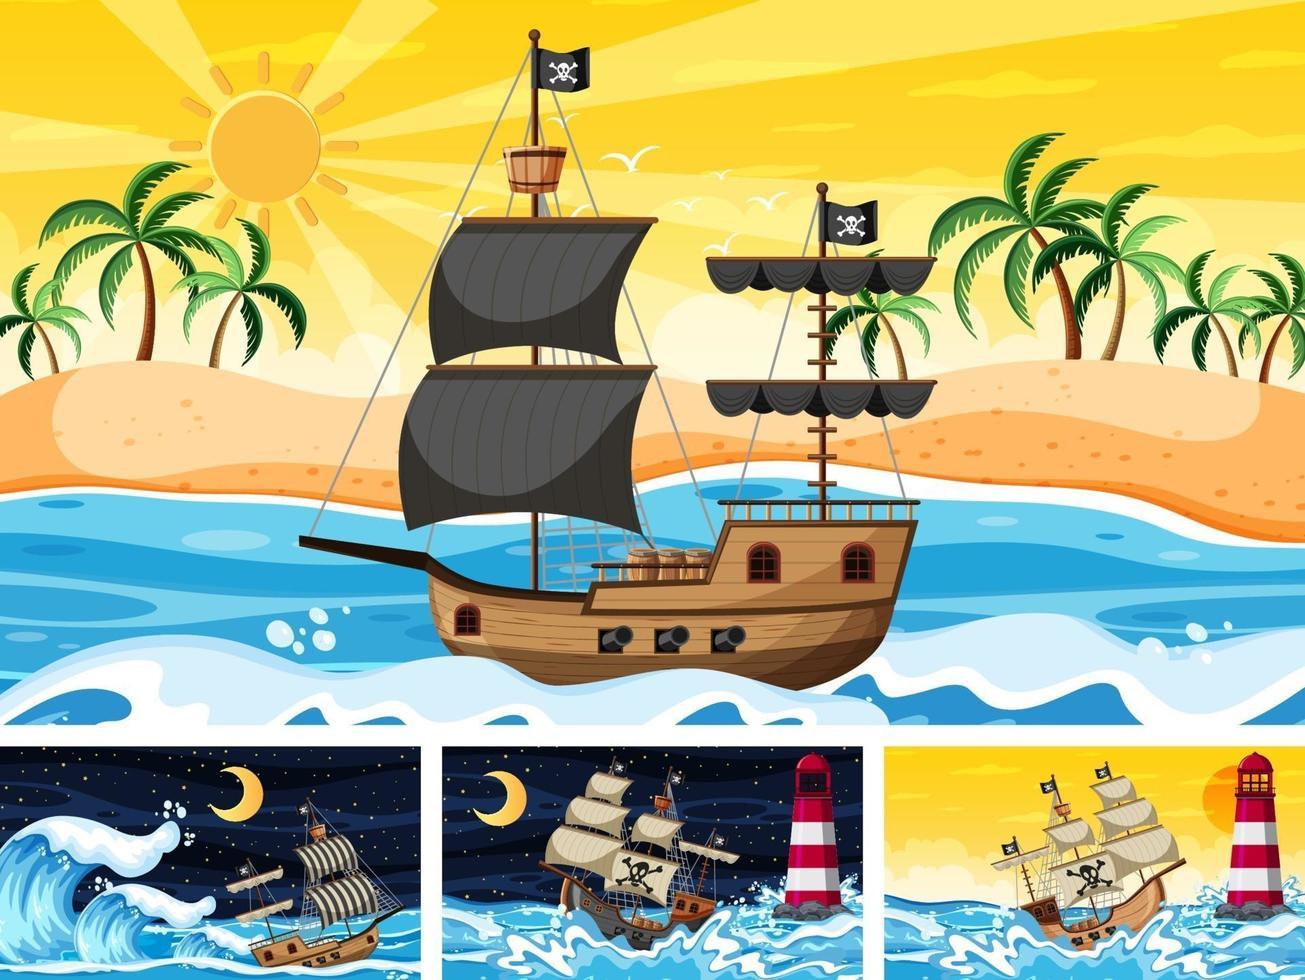 conjunto de océano con barco pirata en diferentes momentos escenas en estilo de dibujos animados vector